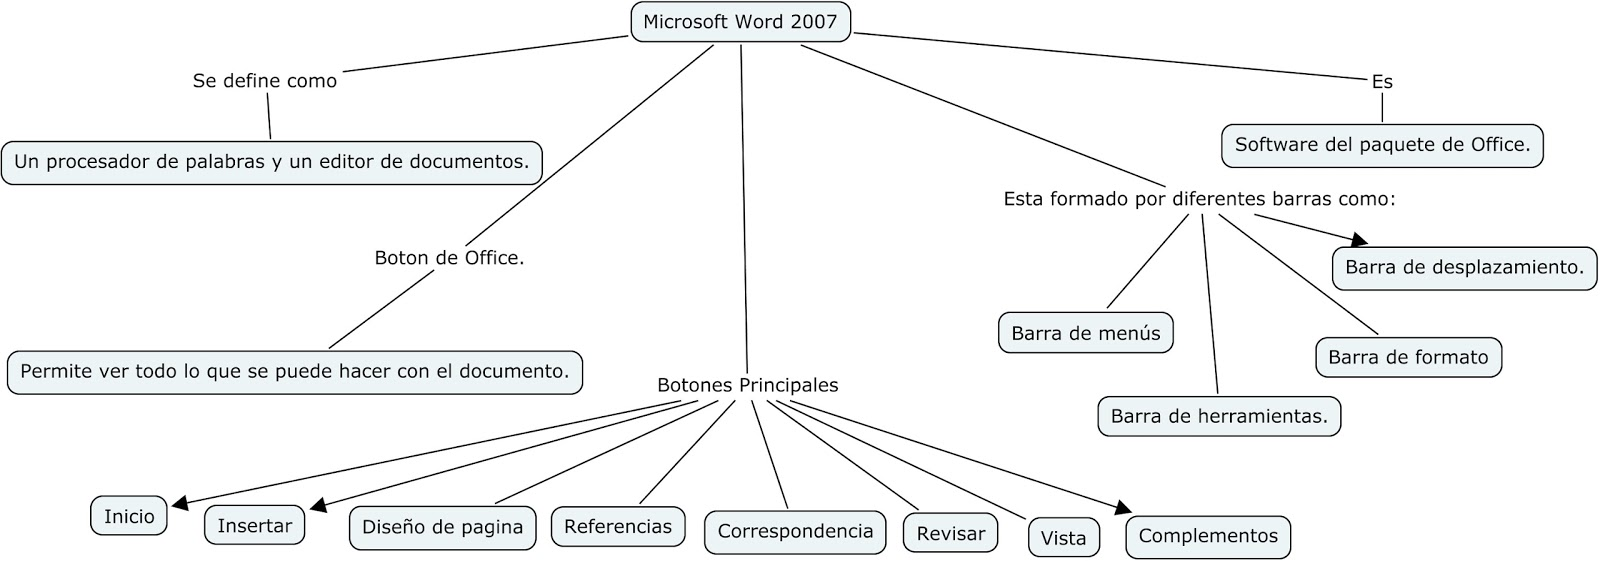 Blog de Marlon Cruz: Mapa Conceptual Microsoft Word 2007